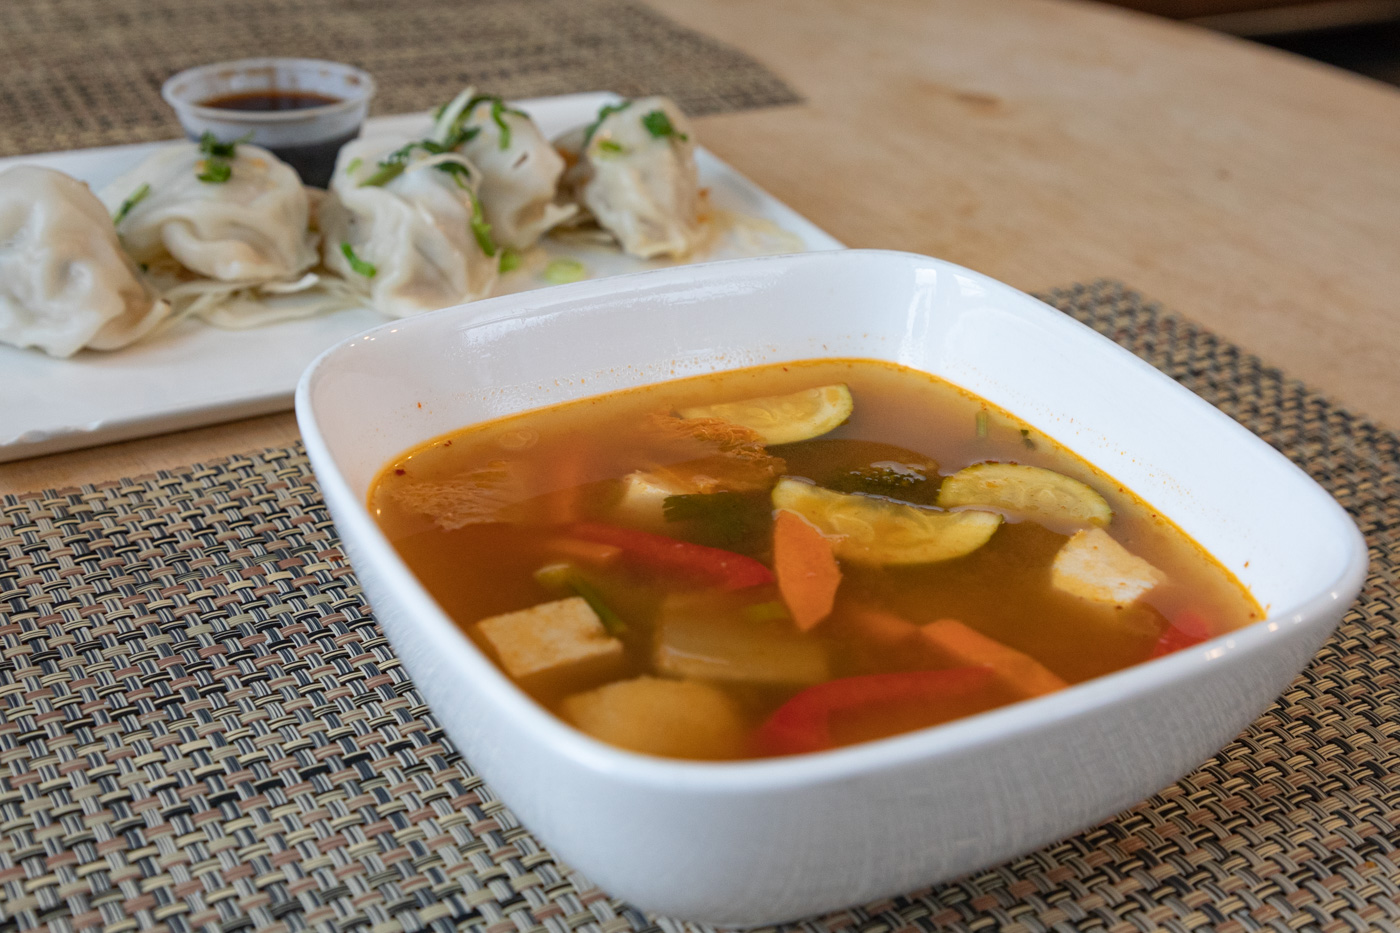 Tom Yum Soup from Sawatdee